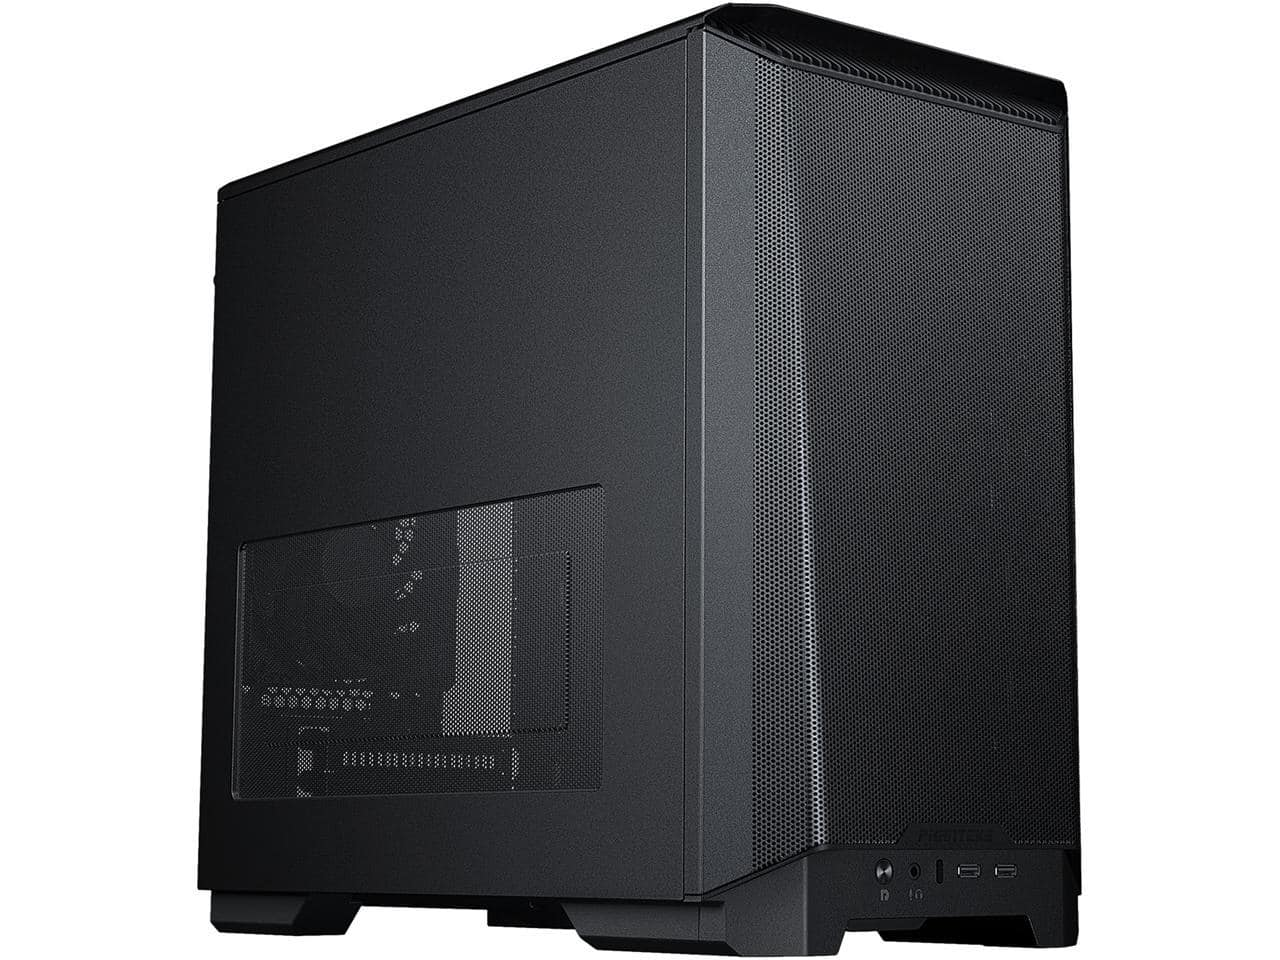 Phanteks Eclipse P200A Airflow mini-ITX Case @Newegg (AR) $50